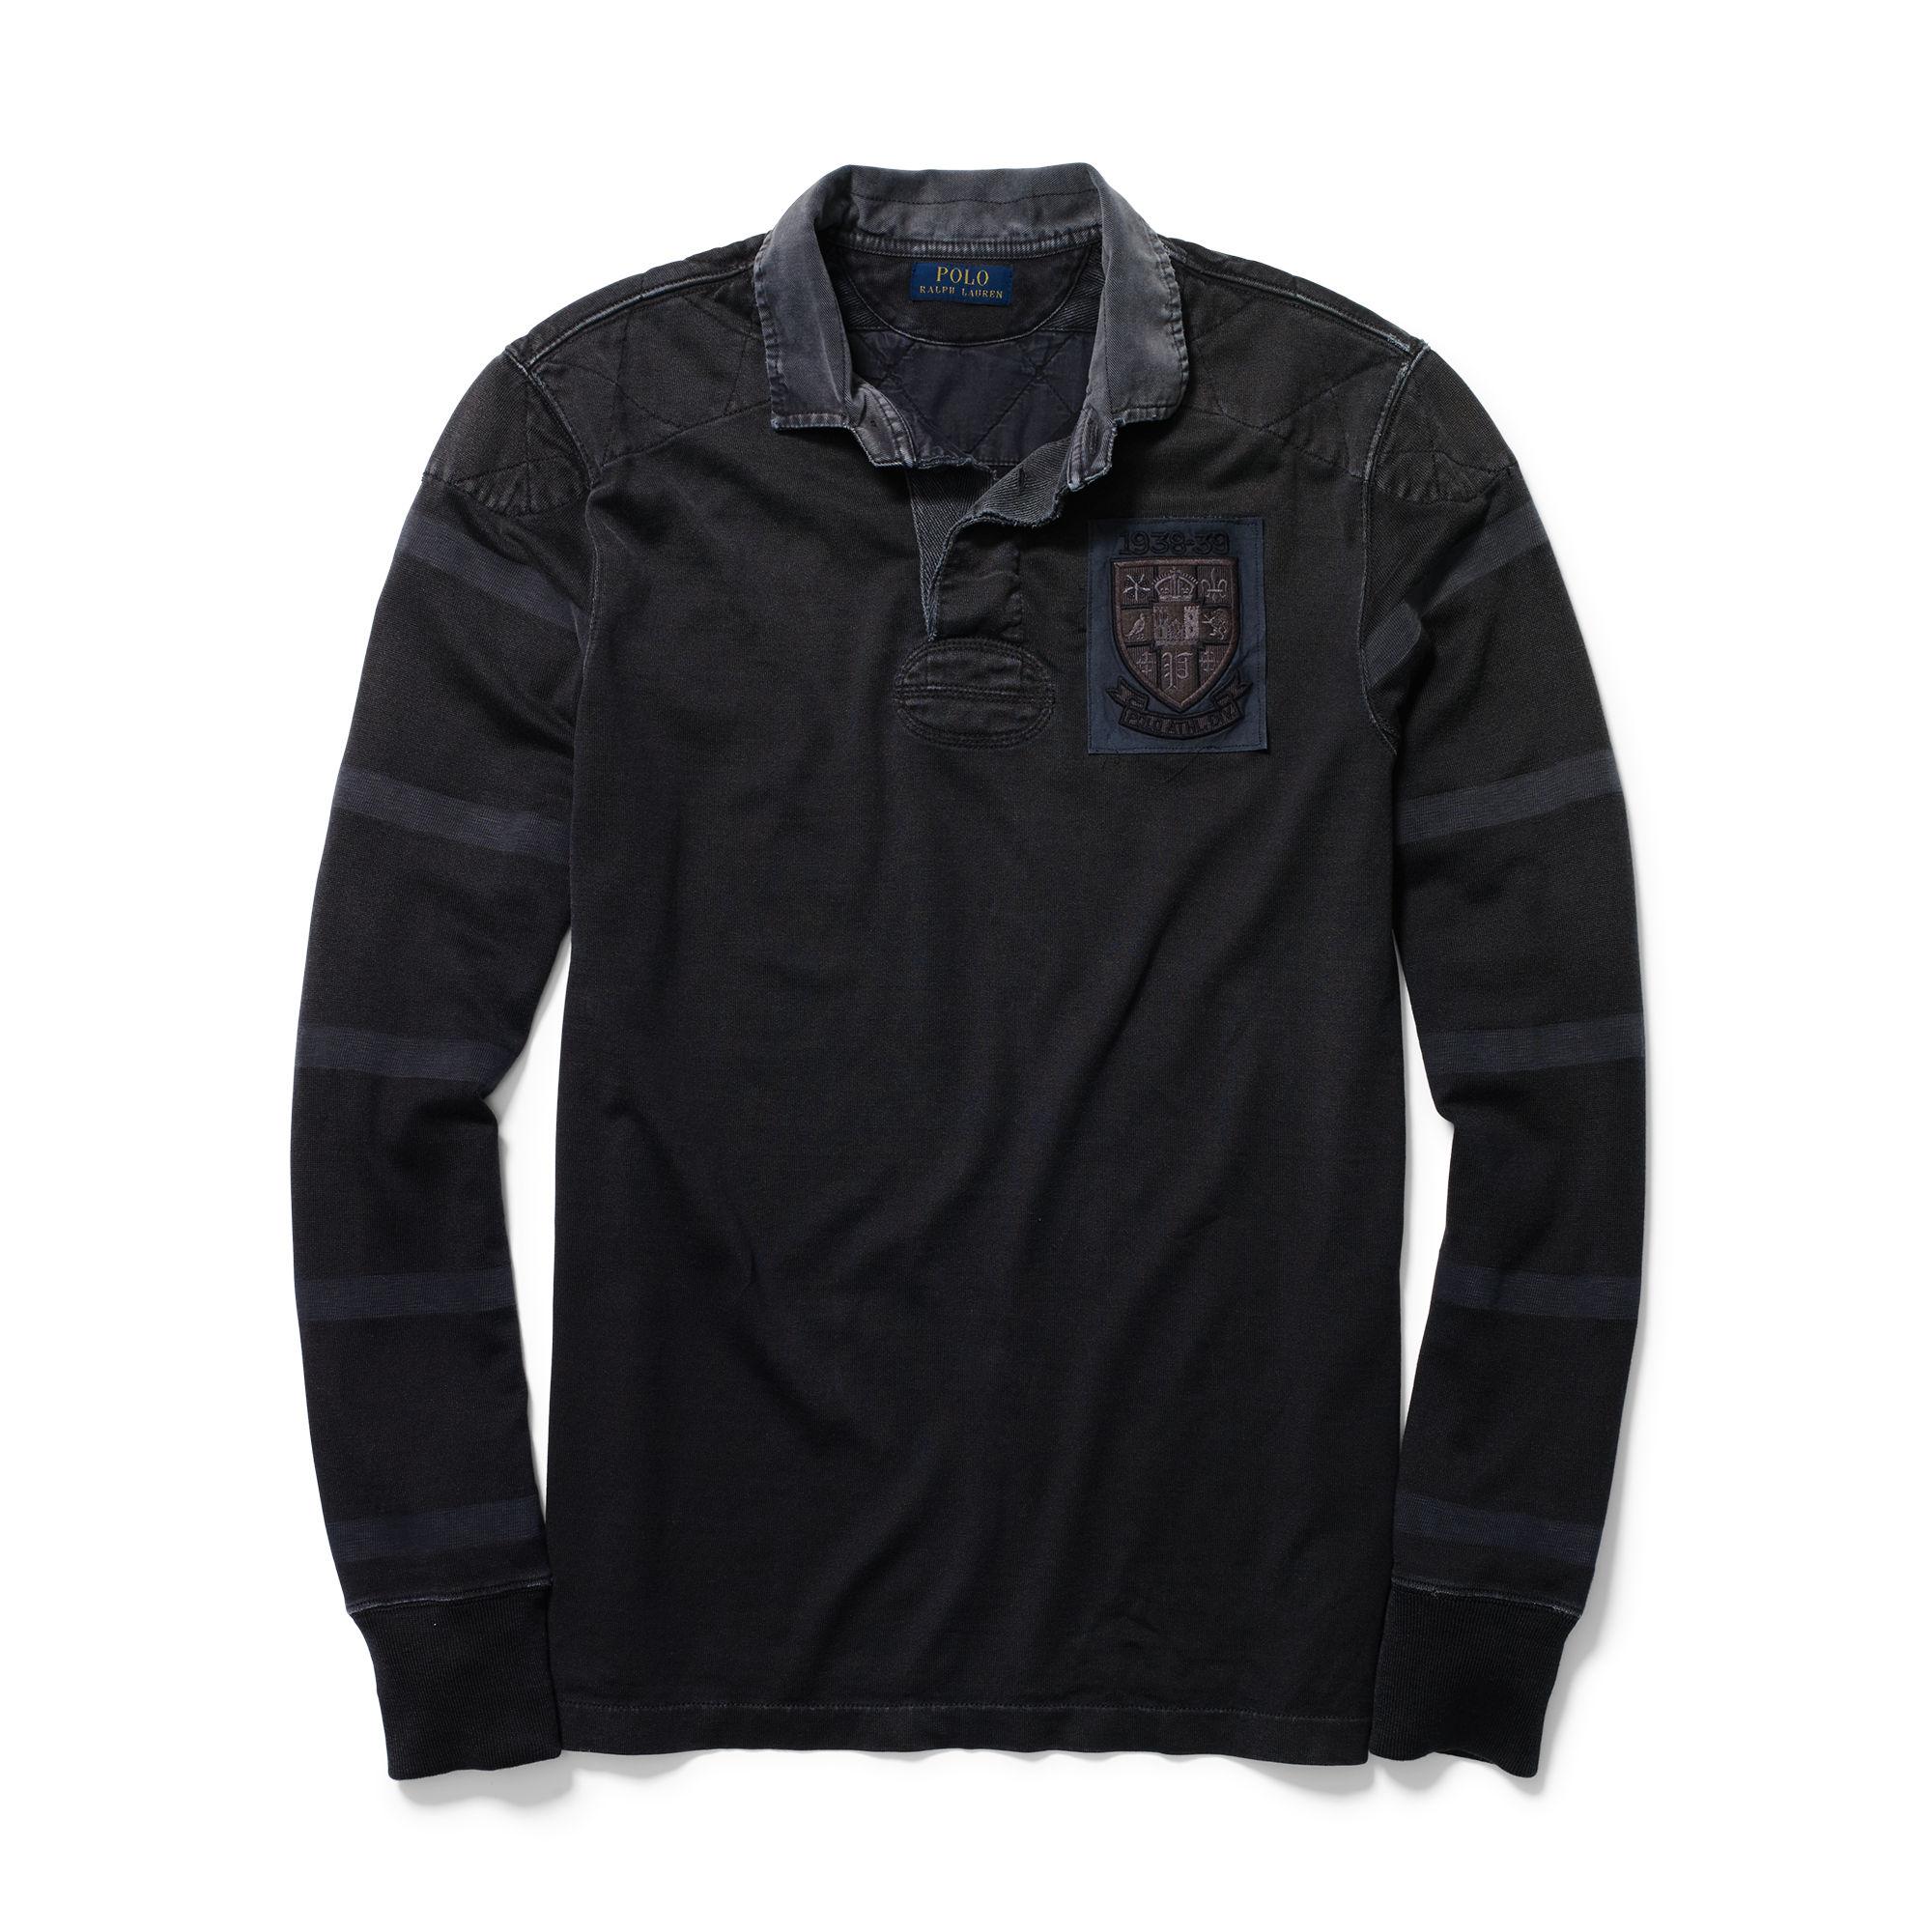 6d932bdb5 ... best polo ralph lauren cotton jersey rugby in black for men lyst 3c05d  17a6d